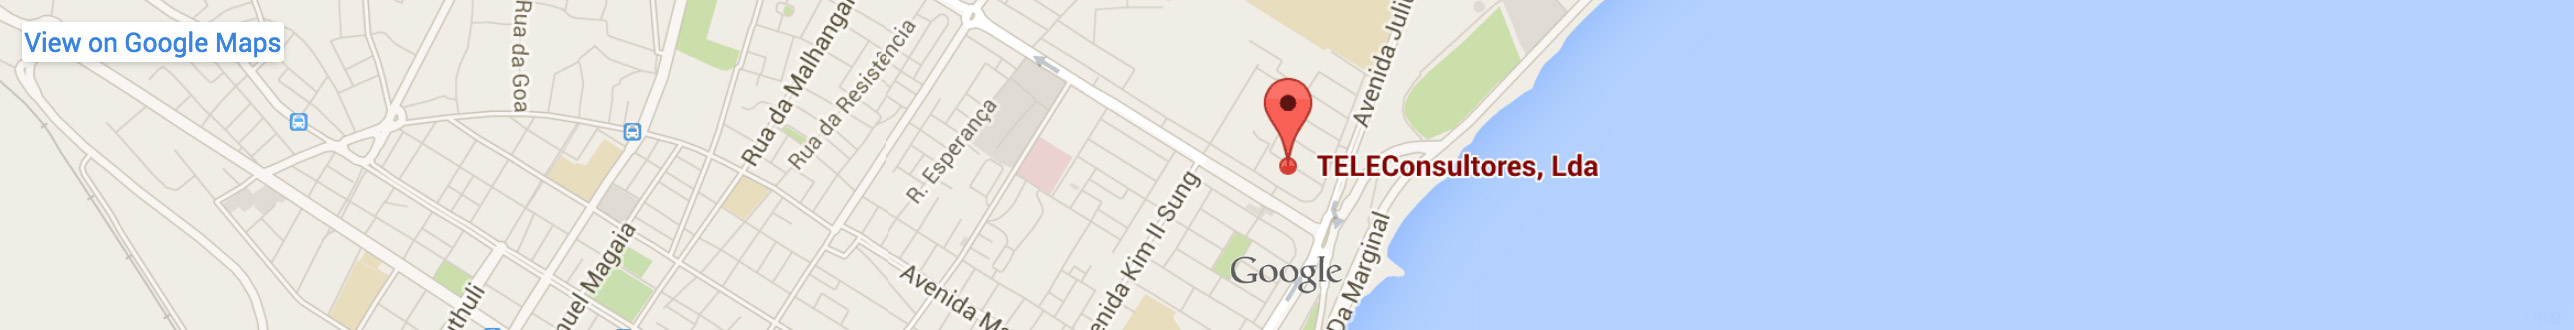 Google-Maps-TELEConsultores